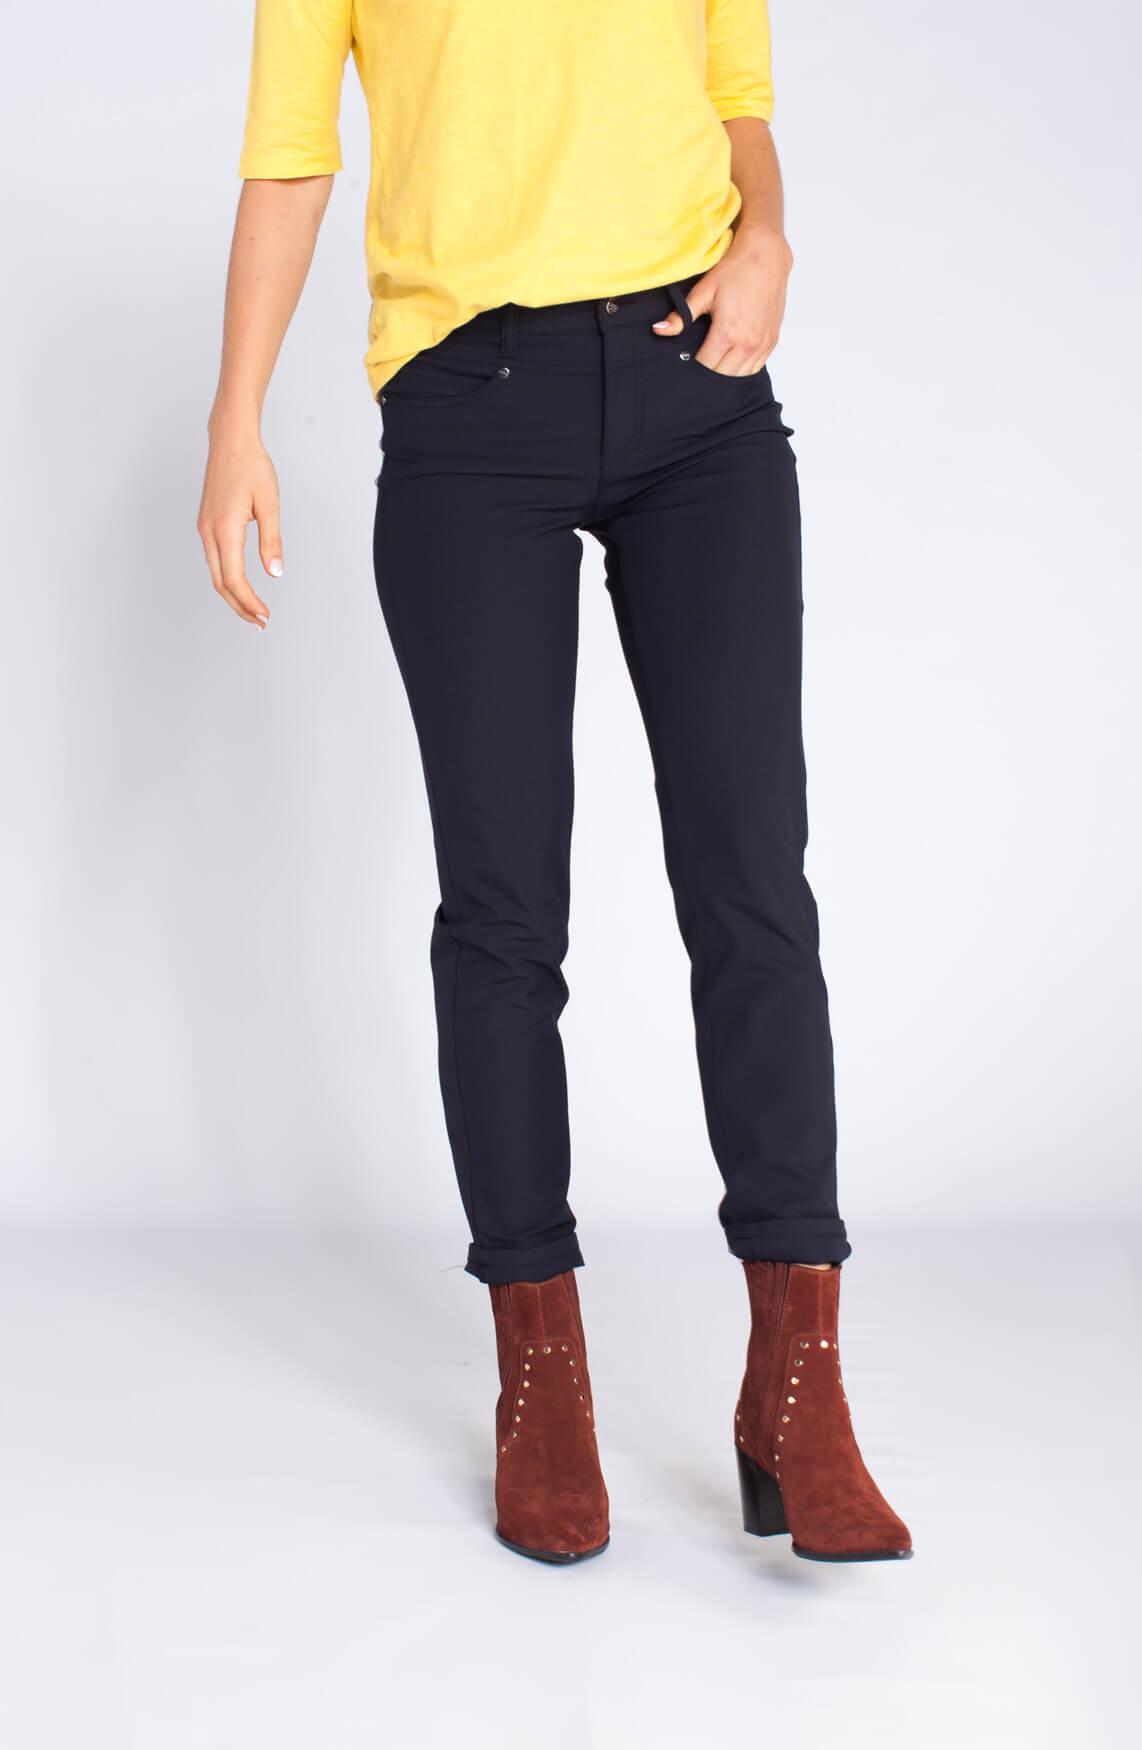 Cambio Dames Posh pantalon blauw Blauw